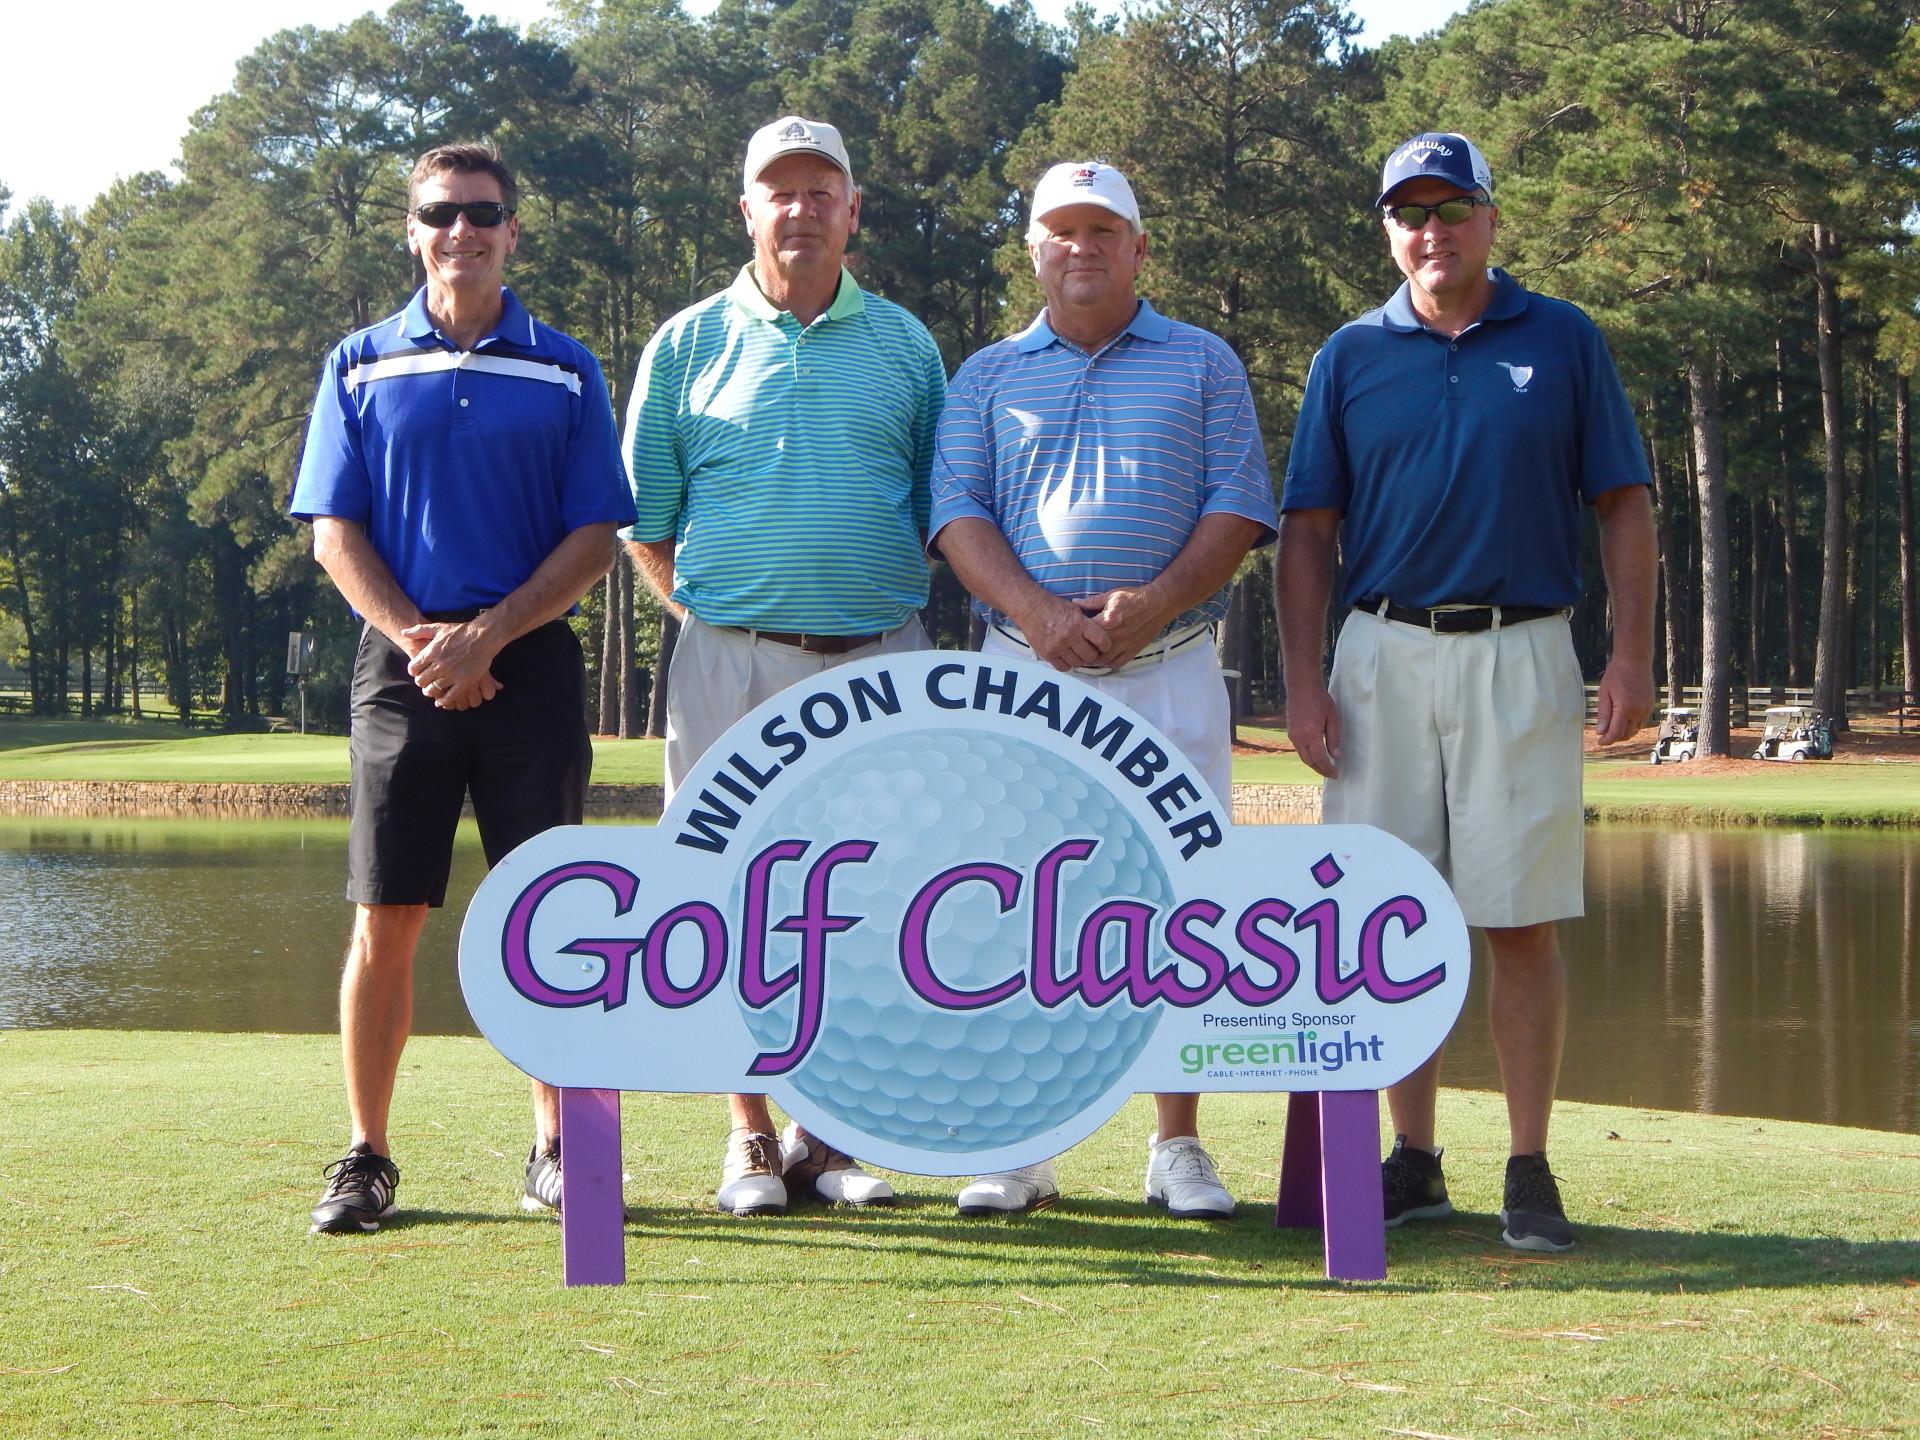 22016-Chamber-Golf-Classic-084.JPG-w1920.jpg